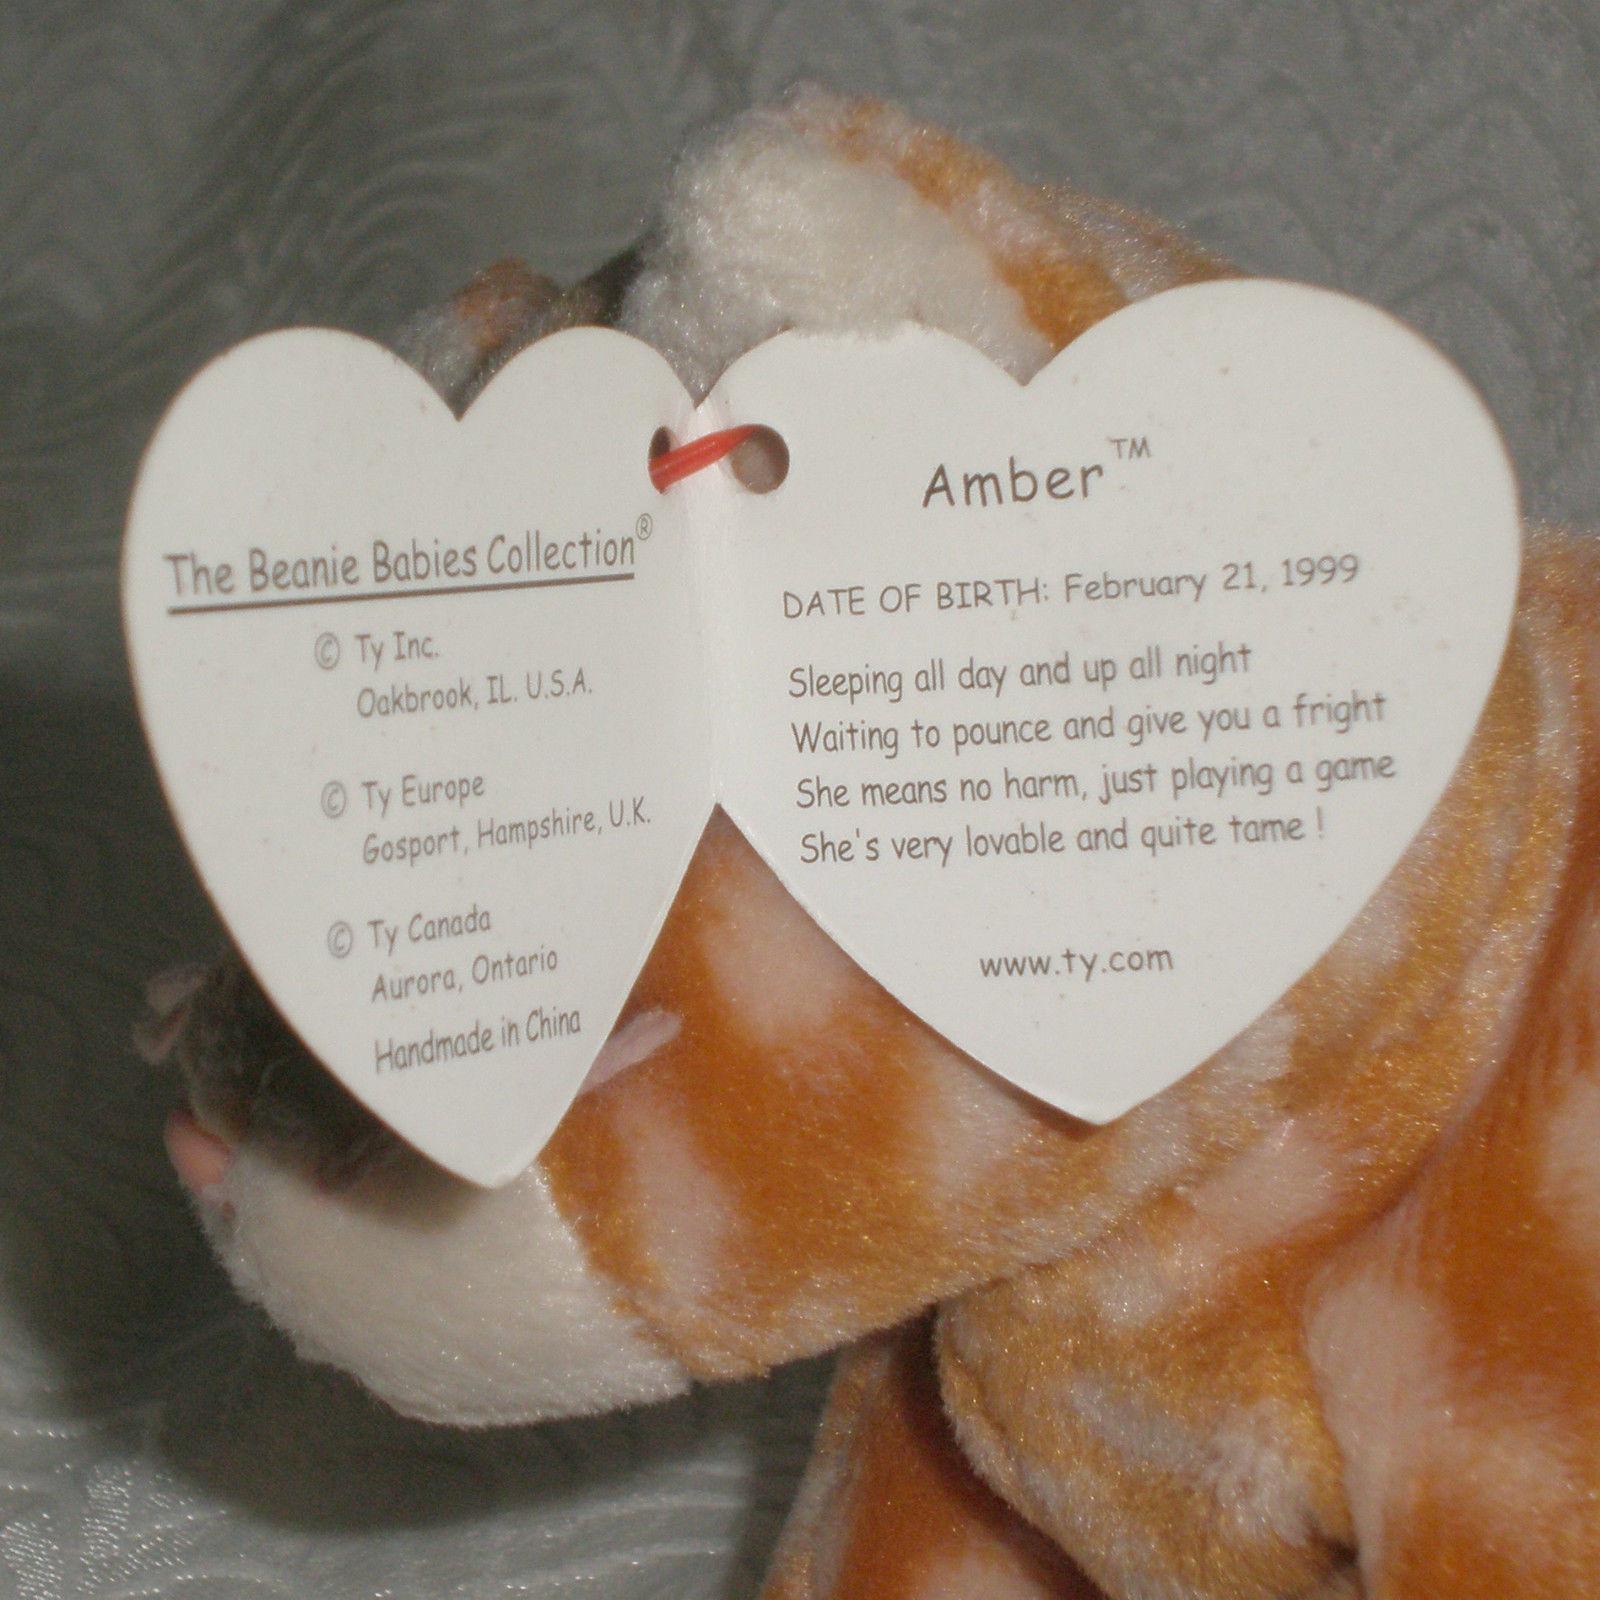 Amber Beanie Babies  Value Guide – Love My Beanies 73e27cd50410